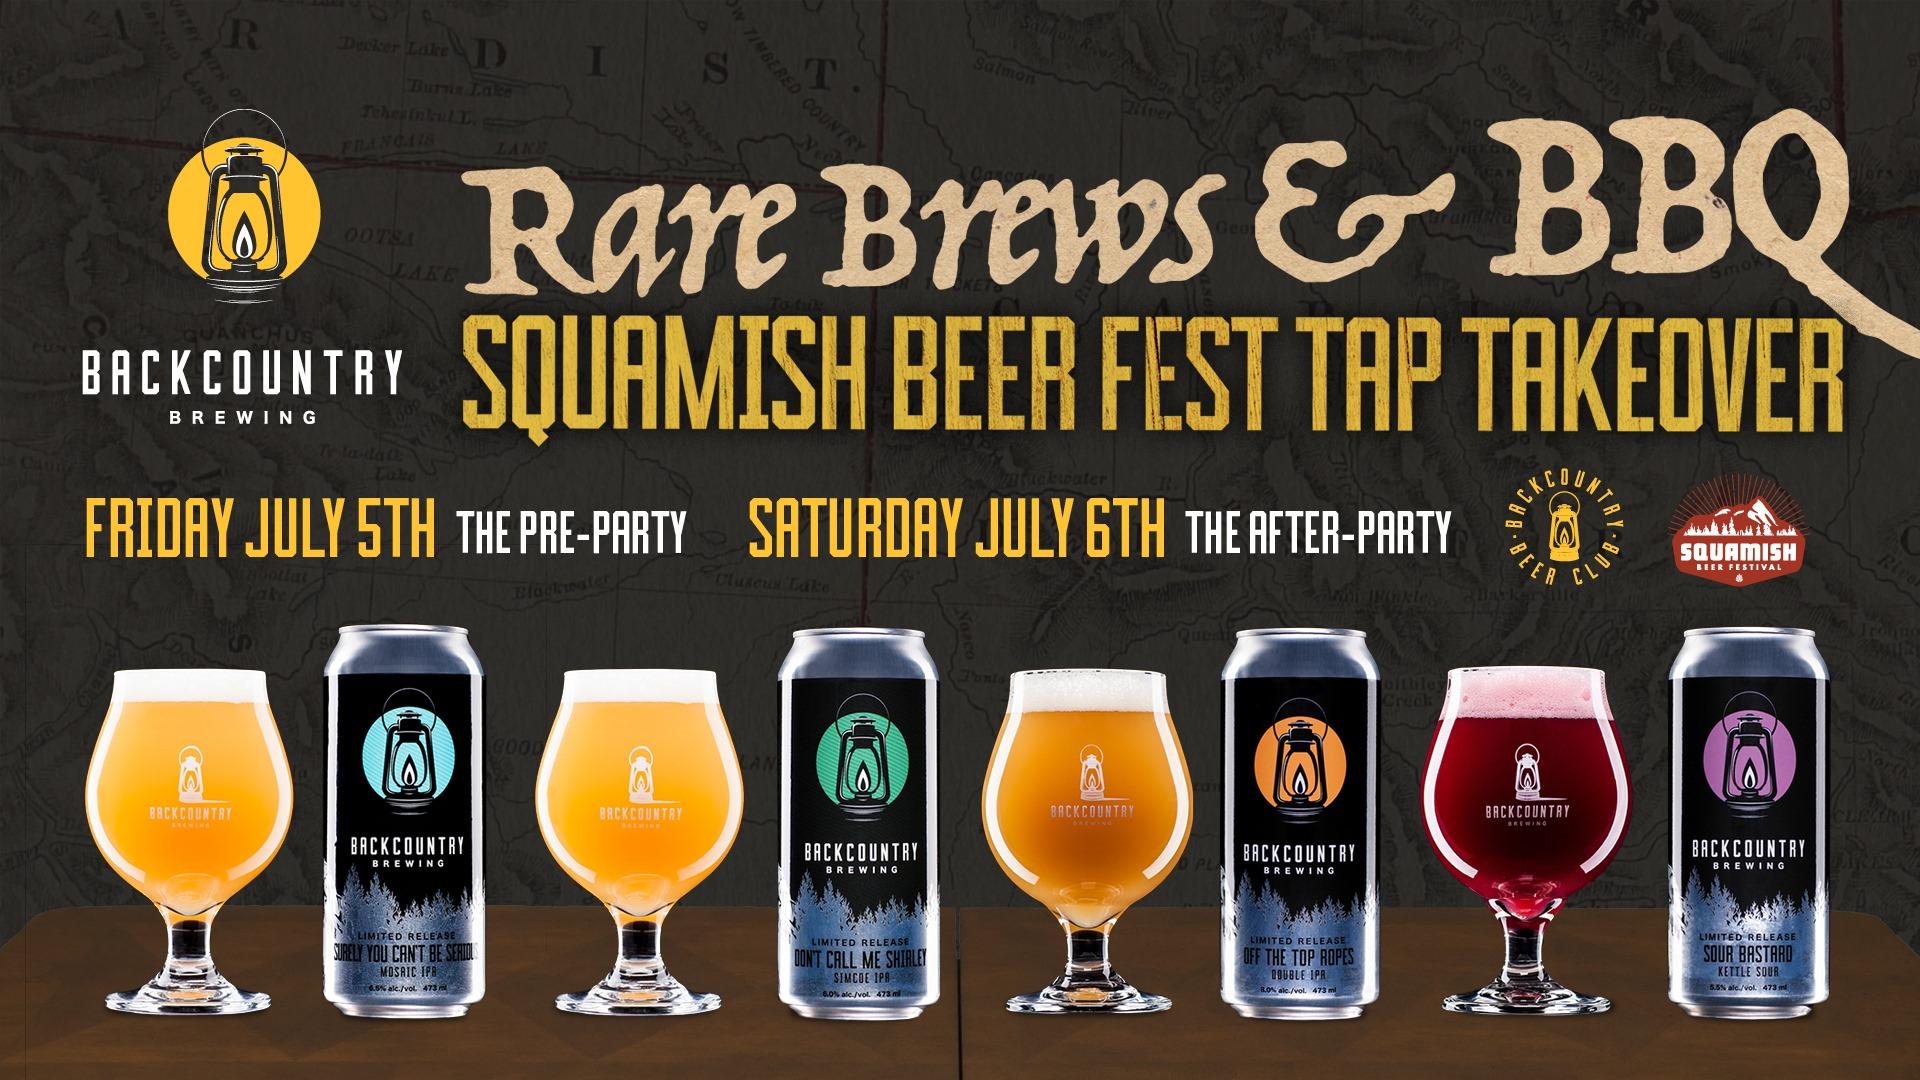 Squamish Beer Fest Tap Takeover: Rare Brews & BBQ